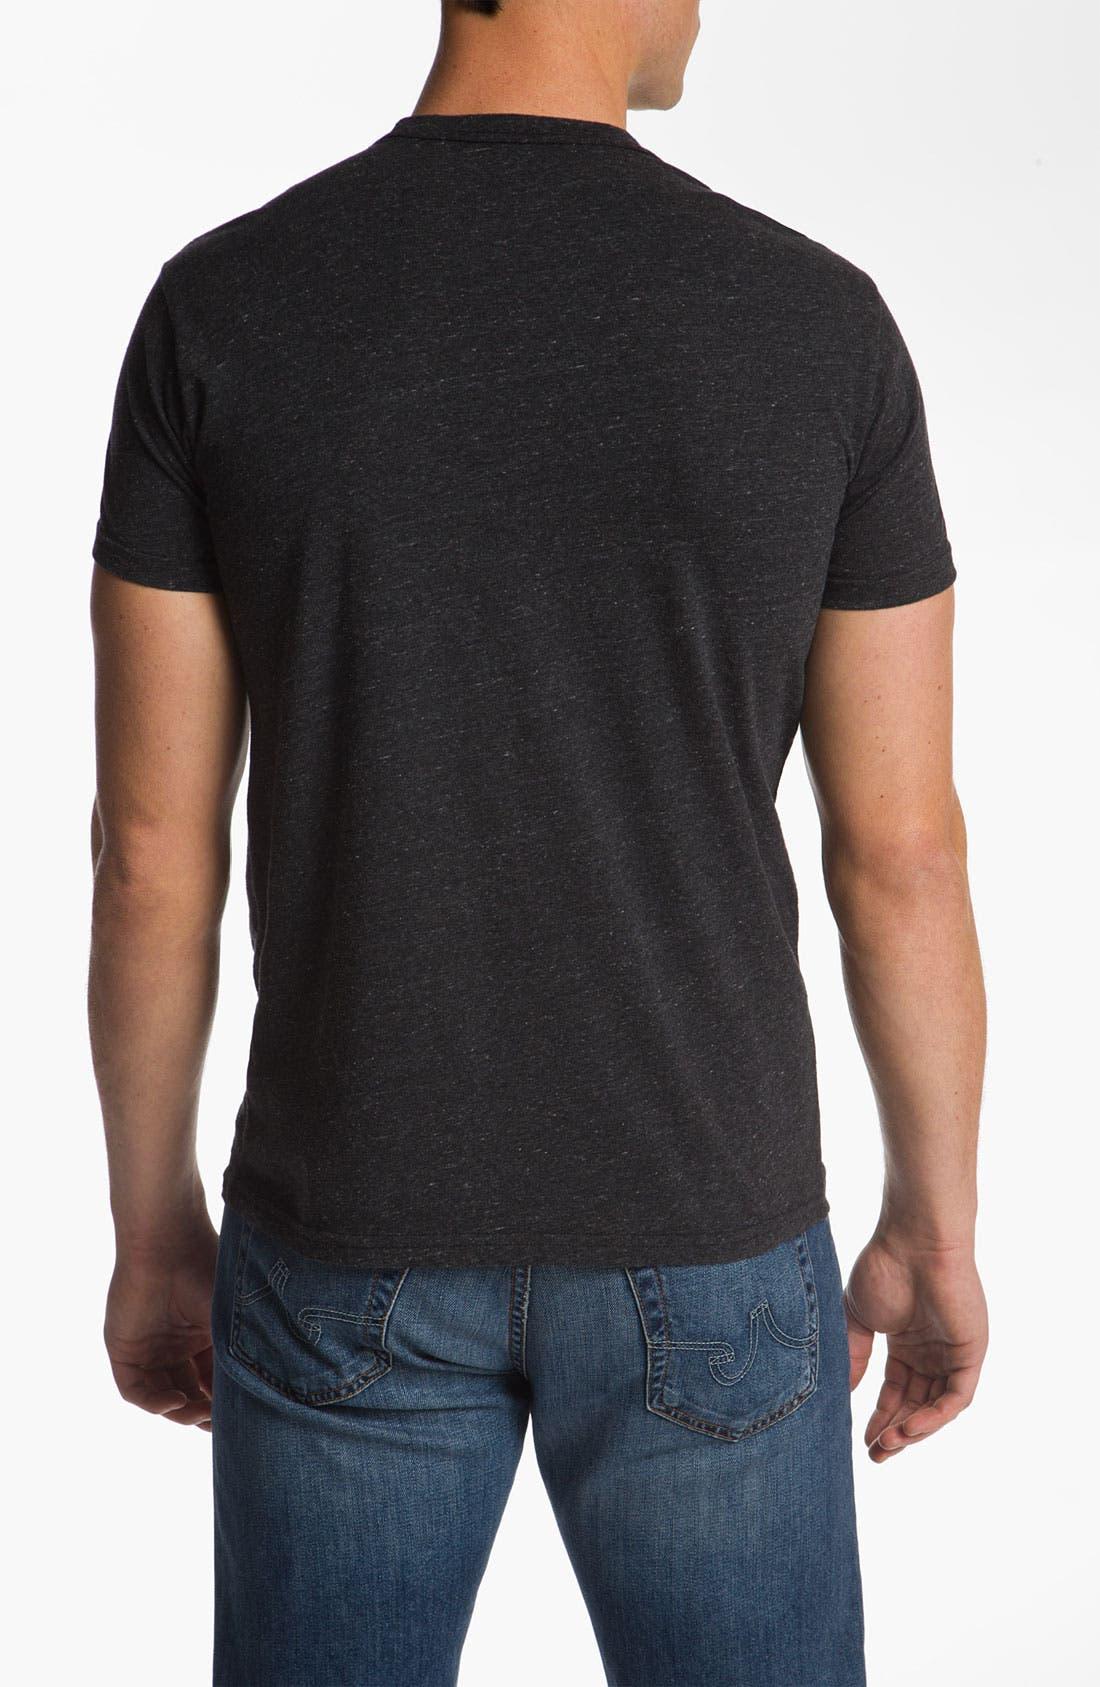 Alternate Image 2  - The Original Retro Brand 'Stanford Cardinal' Crewneck T-shirt (Men)